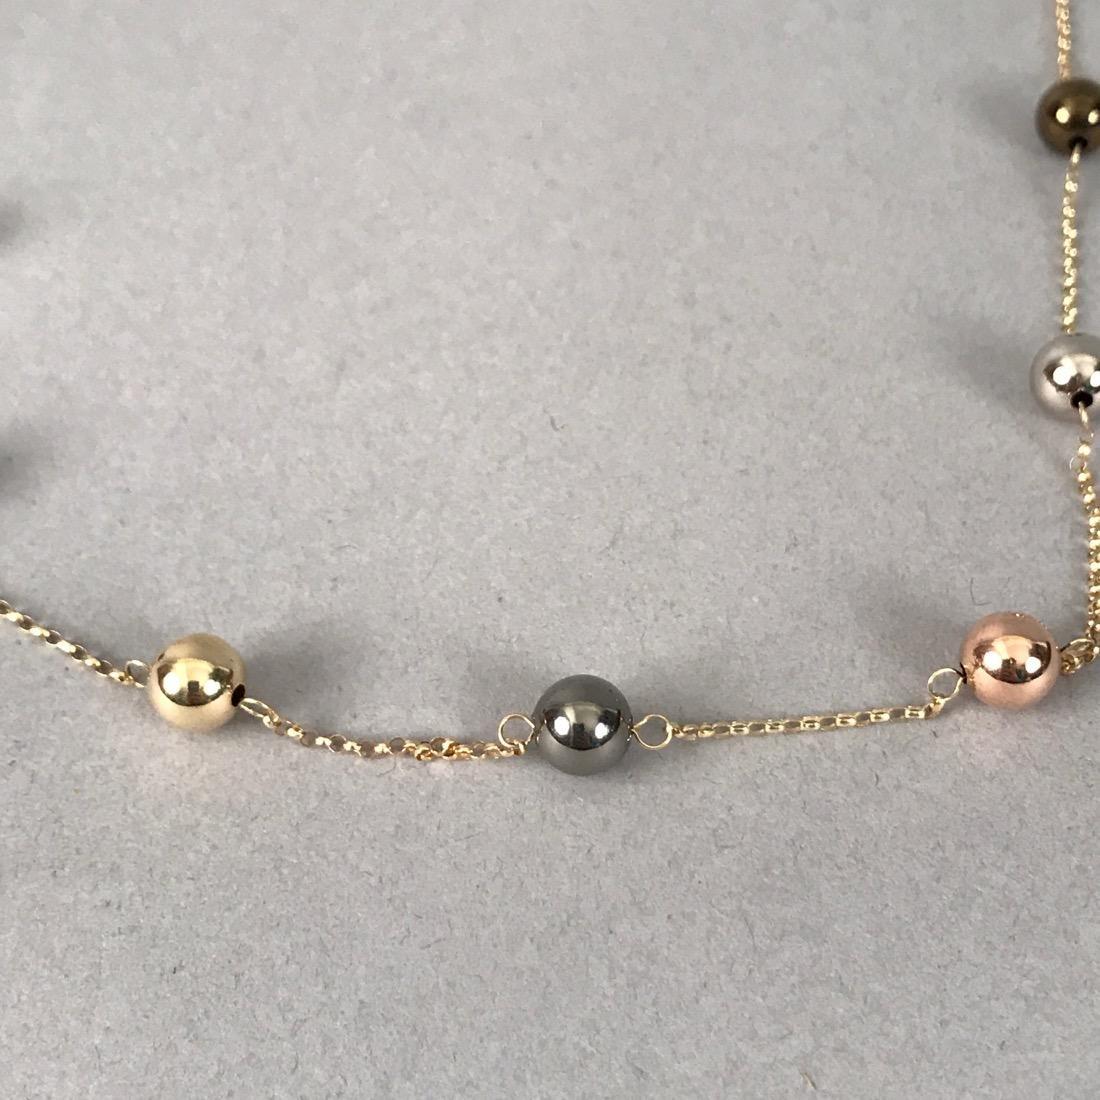 14K Gold JCM Necklace - 2